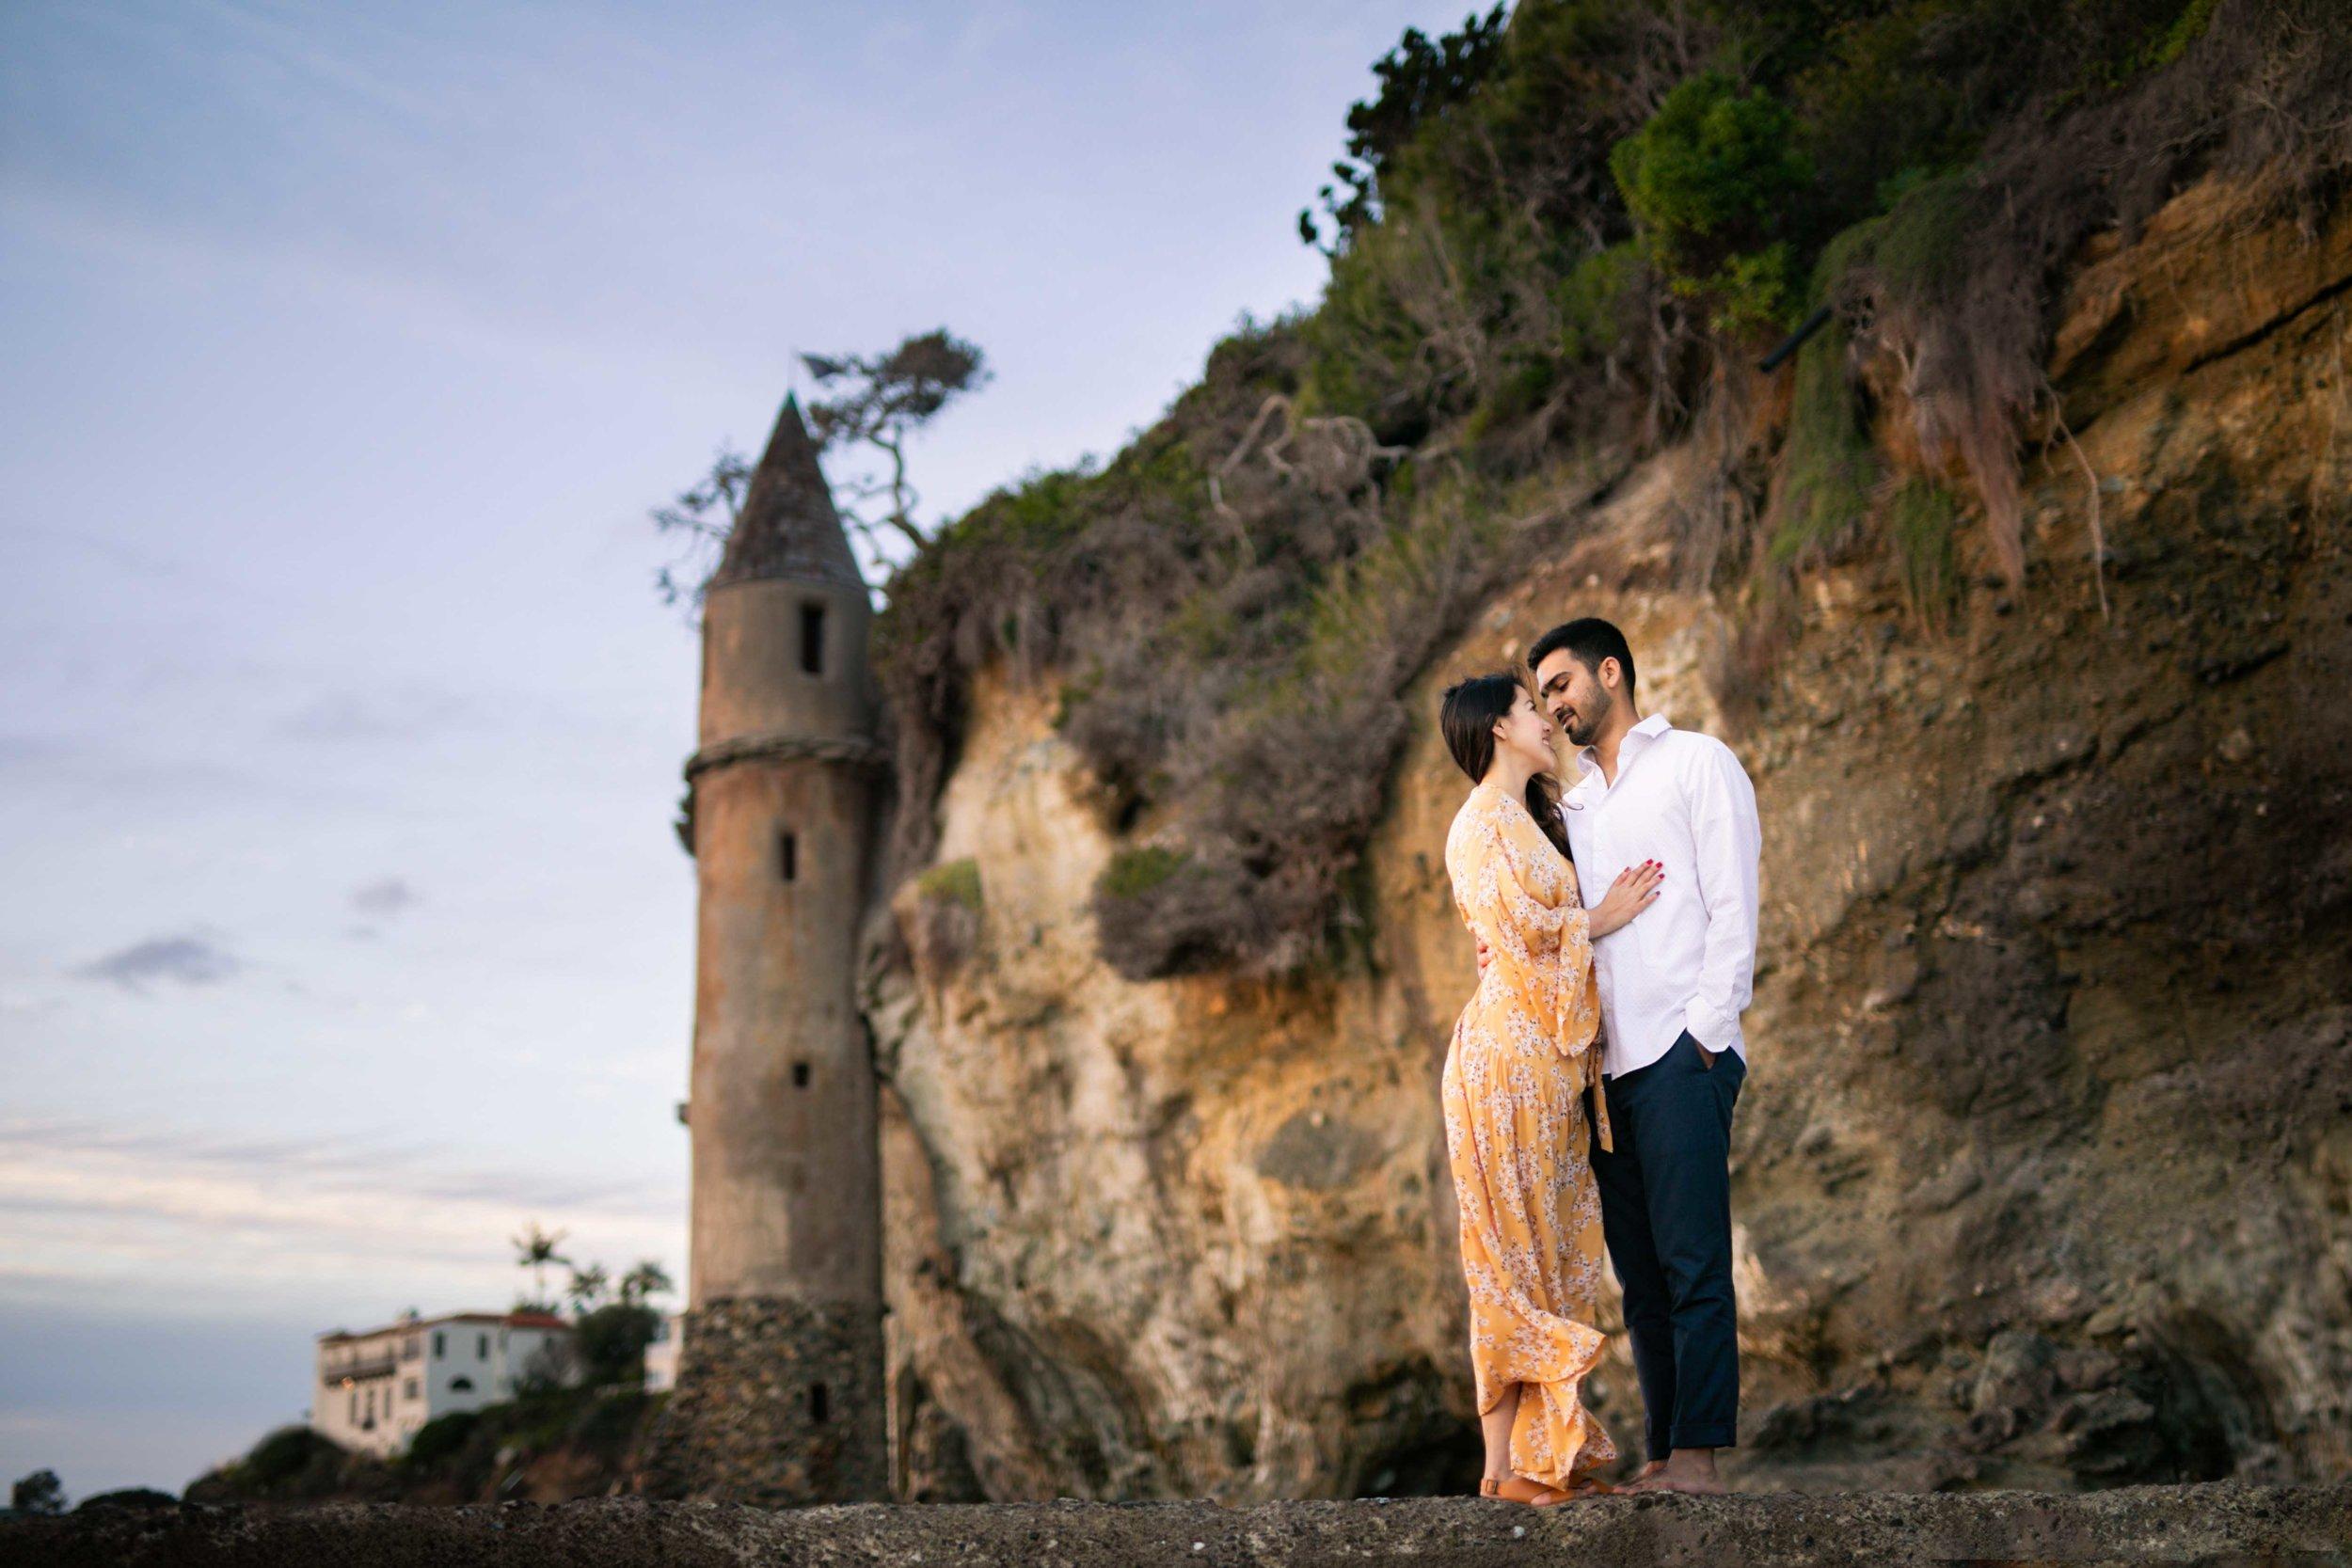 victoria_beach_engagement_joshuachun_photography_-3.JPG